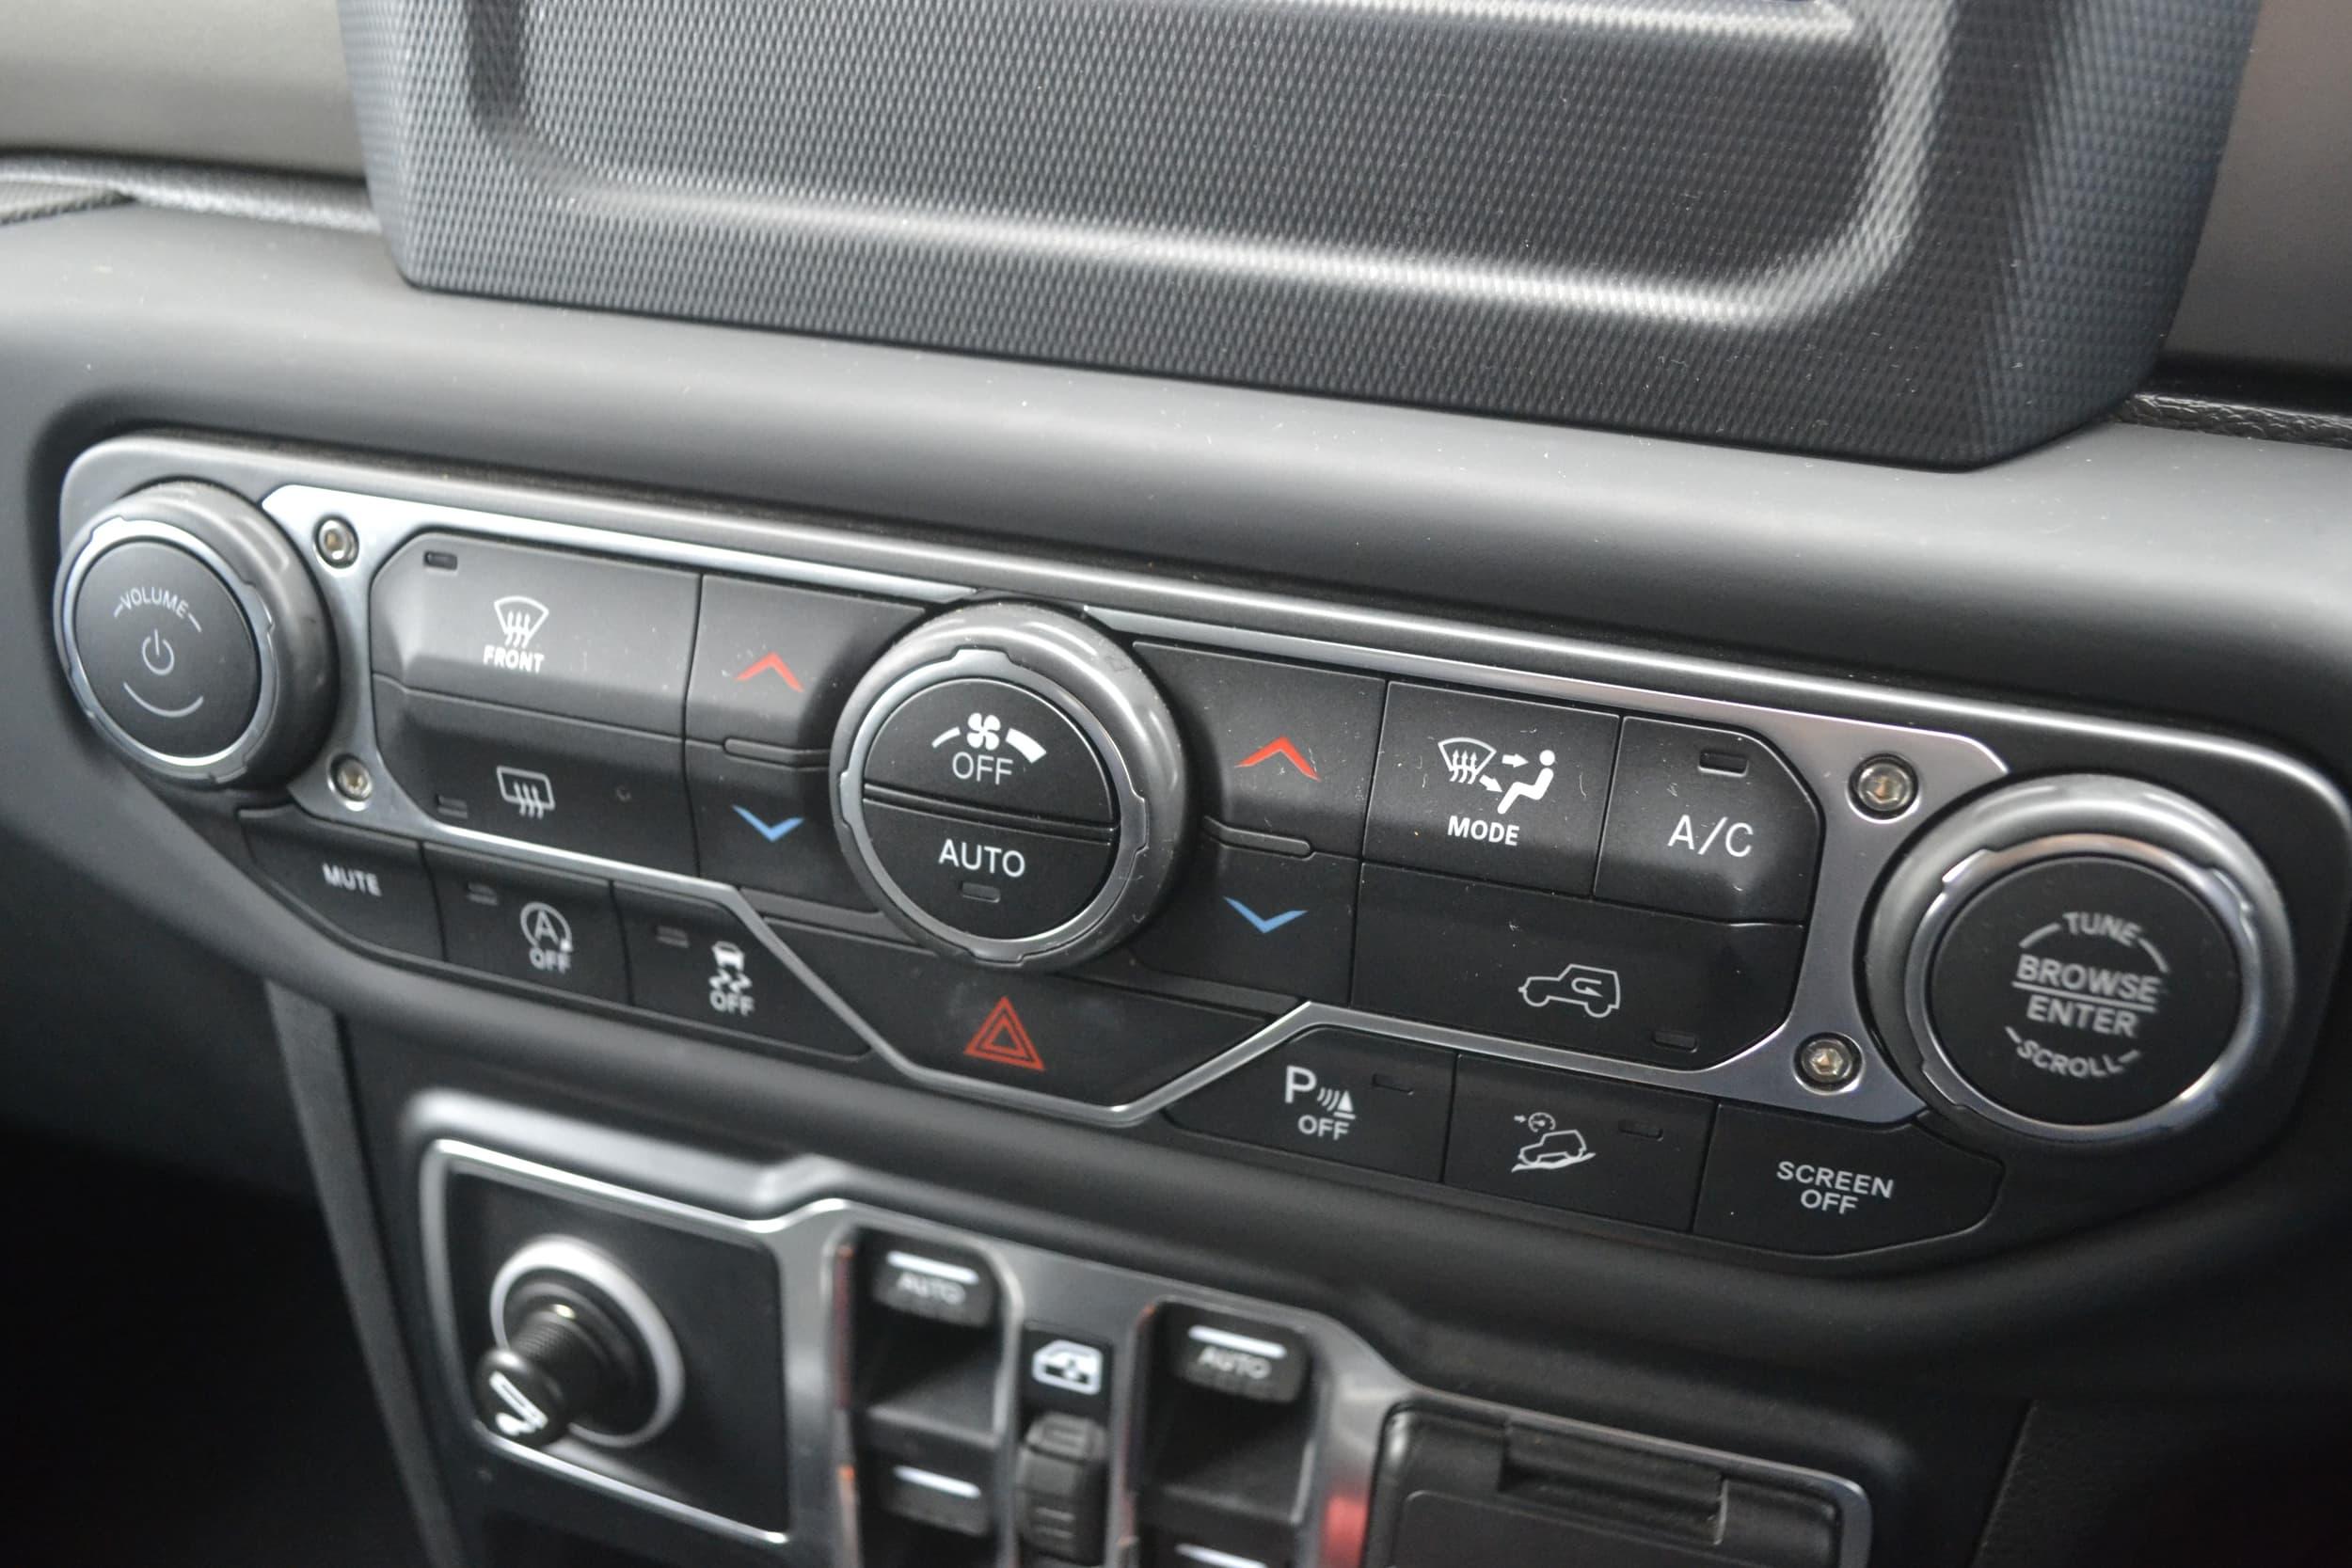 2019 Jeep Wrangler Unlimited Sport S Auto 4x4 MY19 - image 7